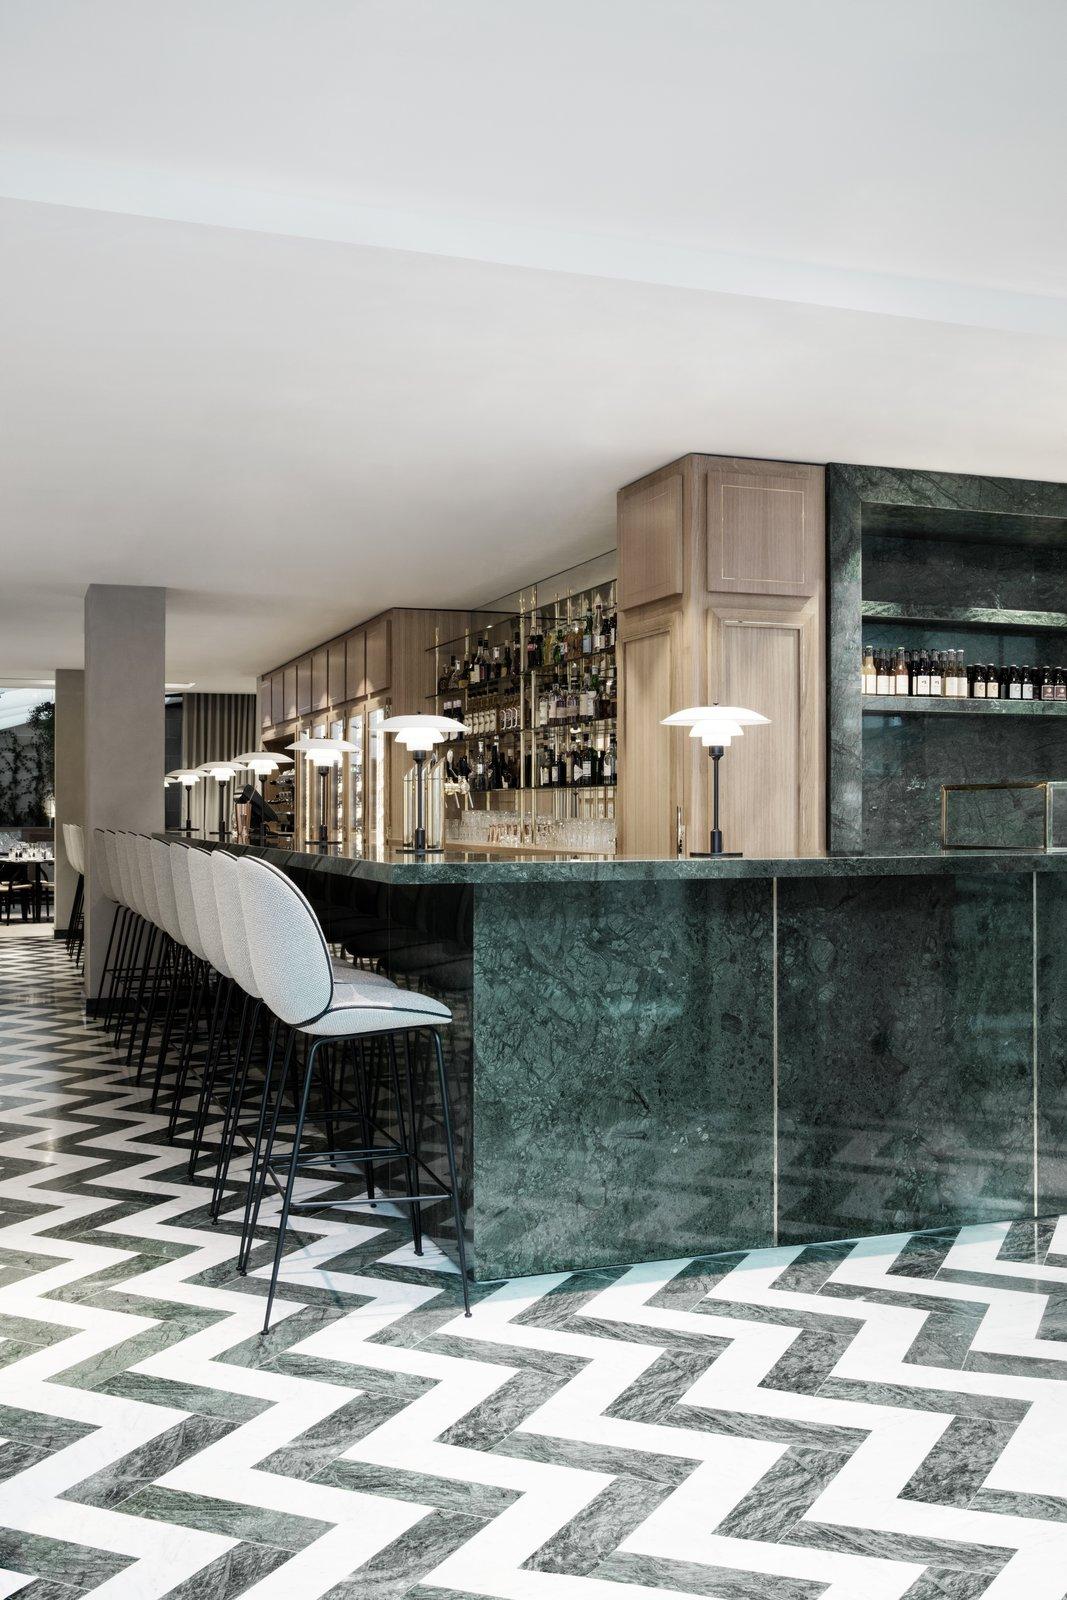 Funky zig-zag restaurant floor pattern.